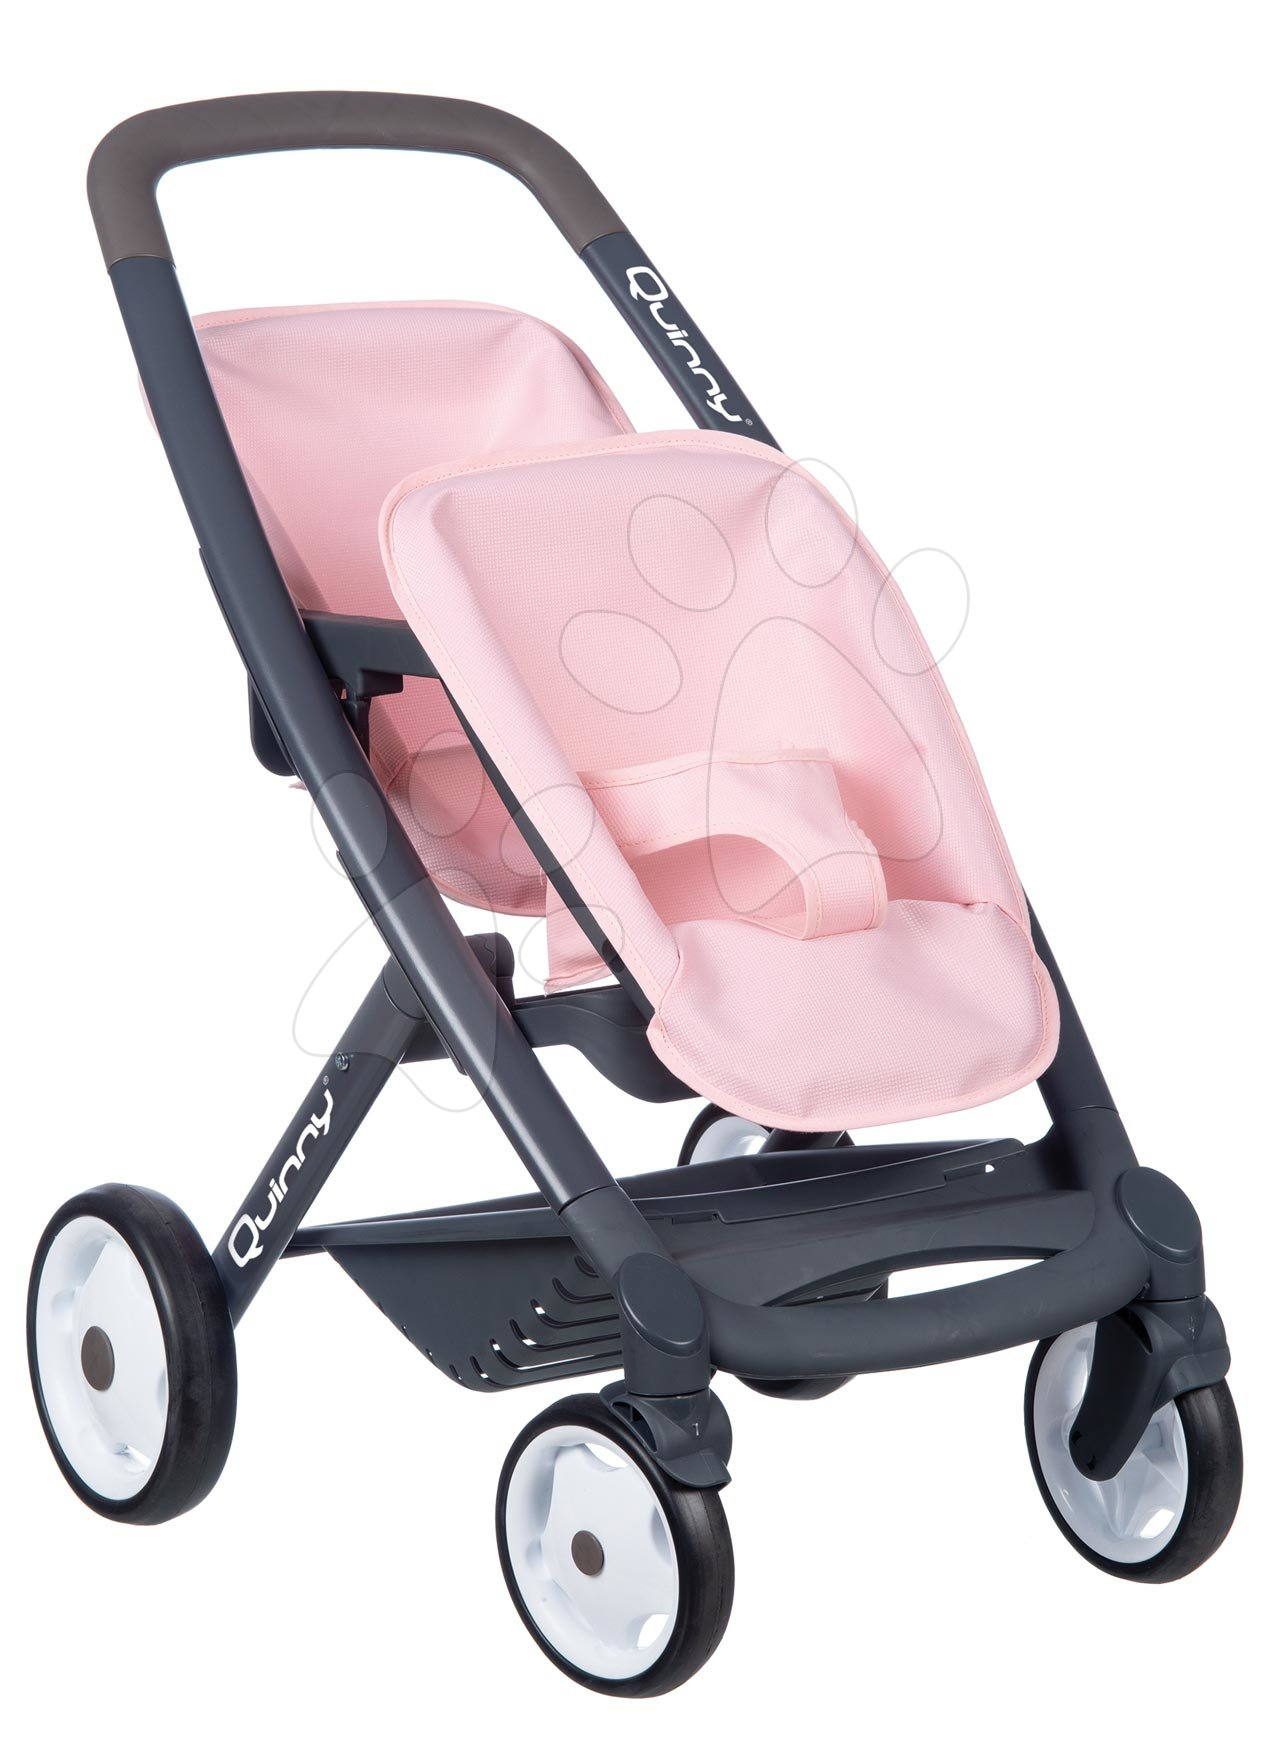 Kočárek pro dvojčata Powder Pink Maxi Cosi&Quinny Smoby s bezpečnostním pásem pro 42 cm panenky